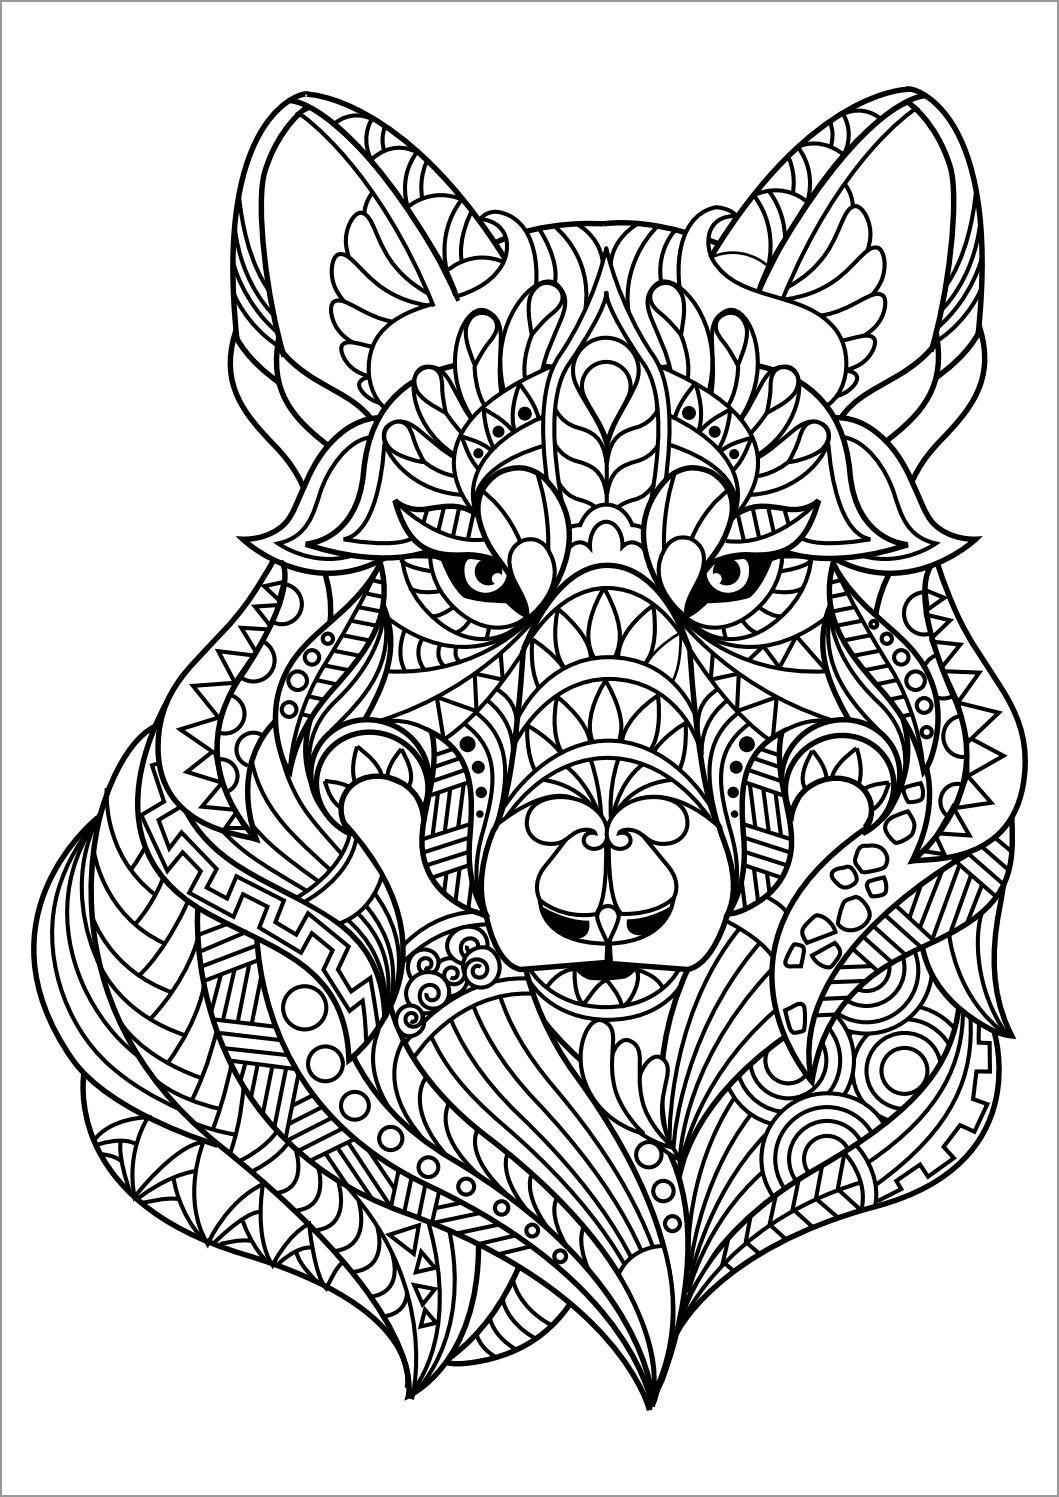 Mandala Lynx Head Coloring Page